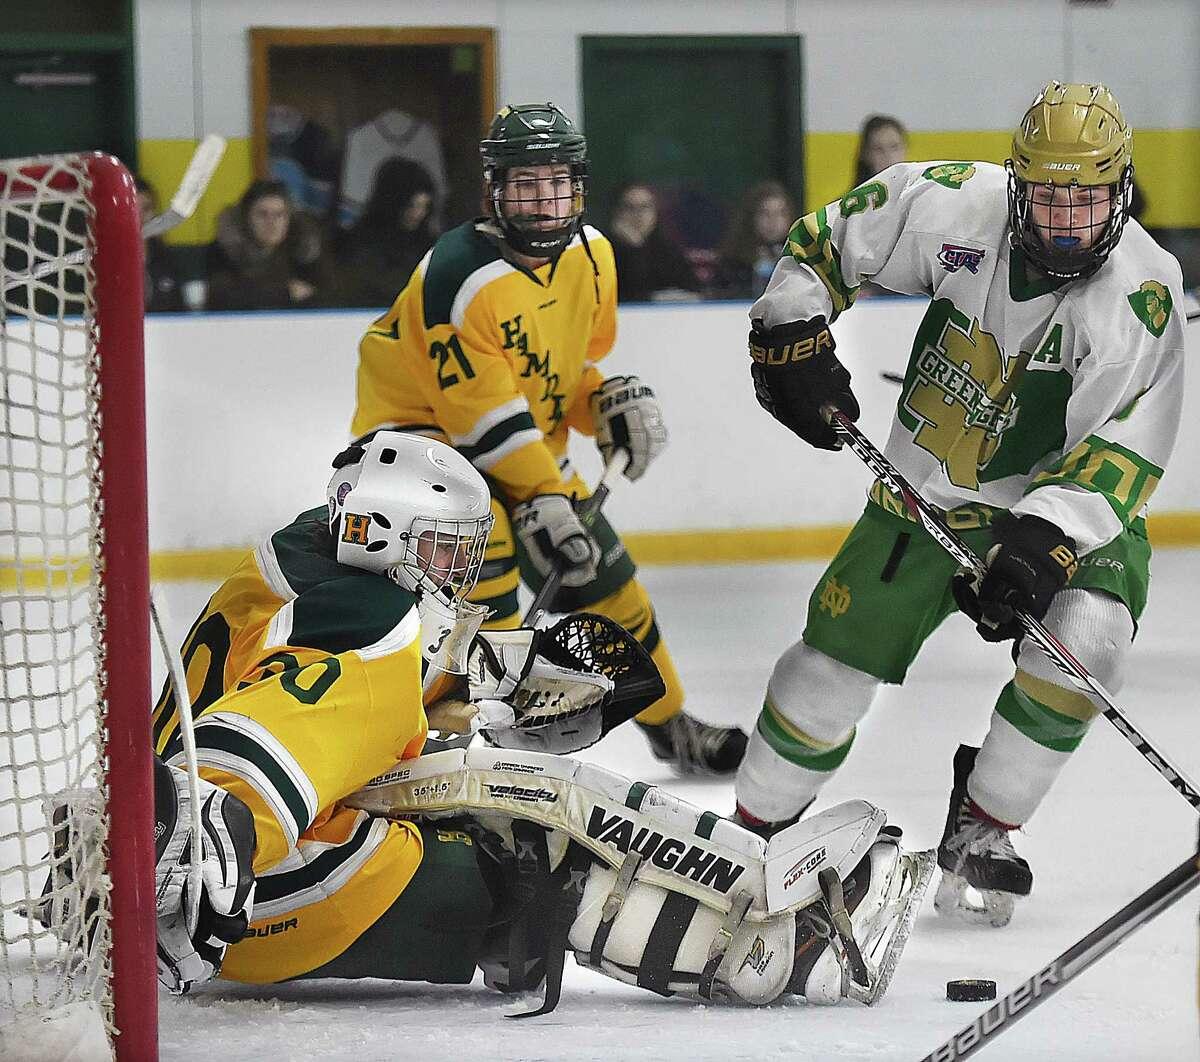 Notre Dame-West Haven defenseman Clay Coassin scores as Hamden goalie Steven Turner attempts to make the save Saturday at Astorino Rink in Hamden.